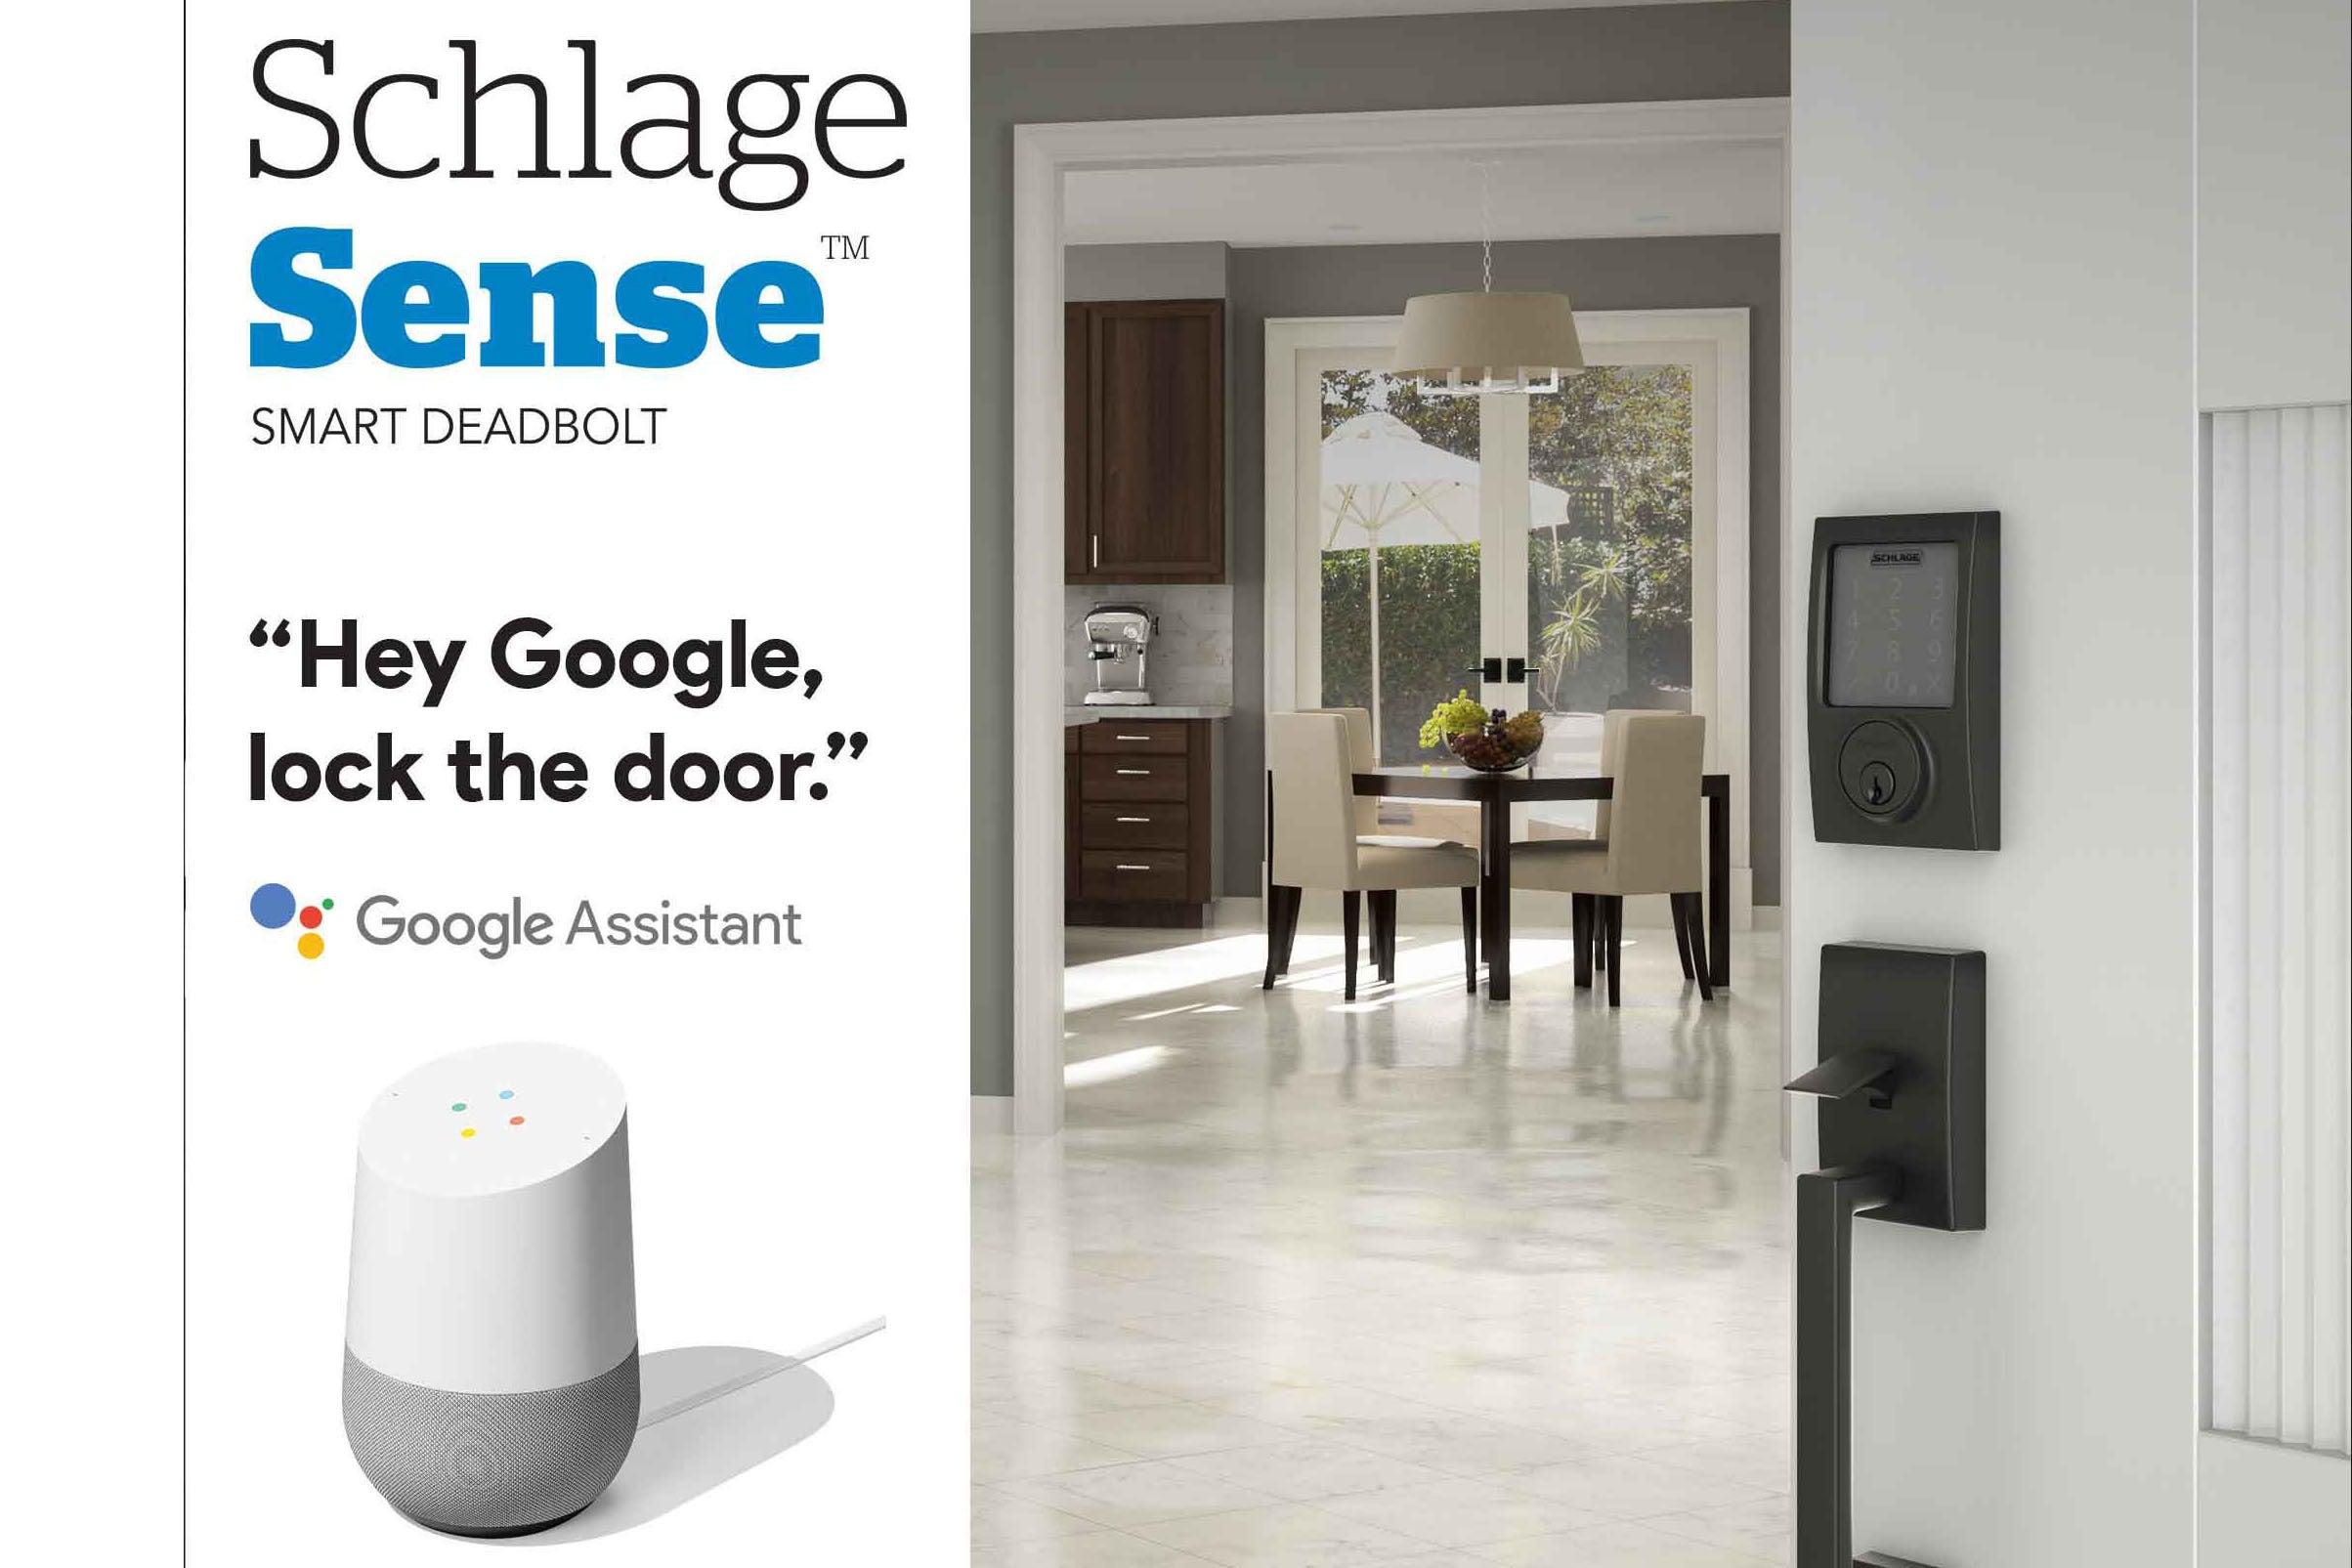 Schlage Sense Smart Deadbolt Is Getting Google Assistant